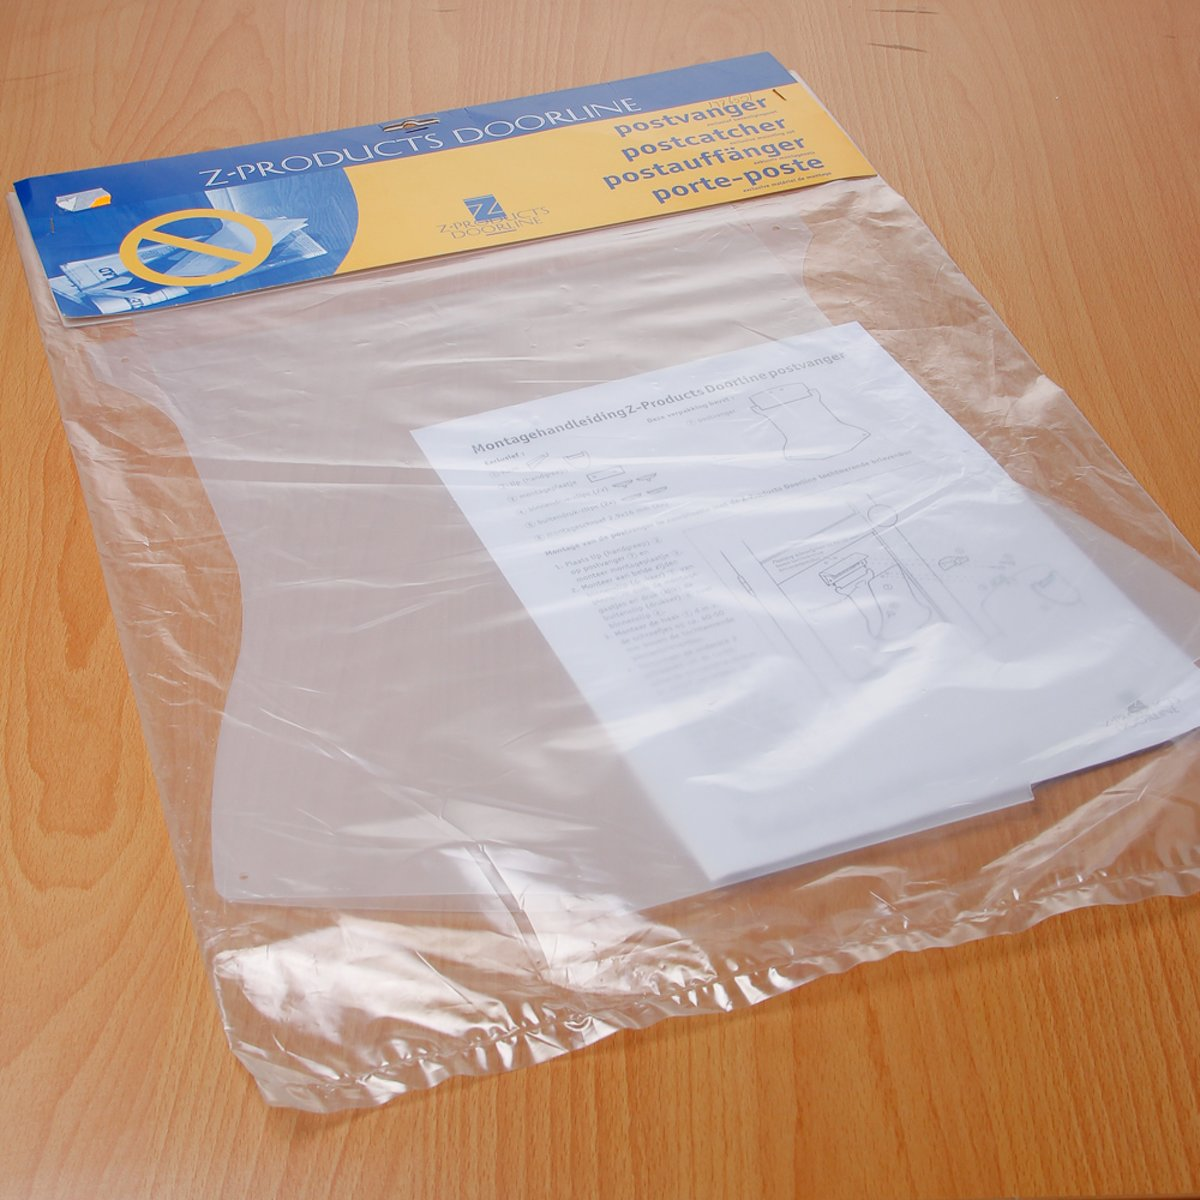 Gezu Postkeeper transparant/wit